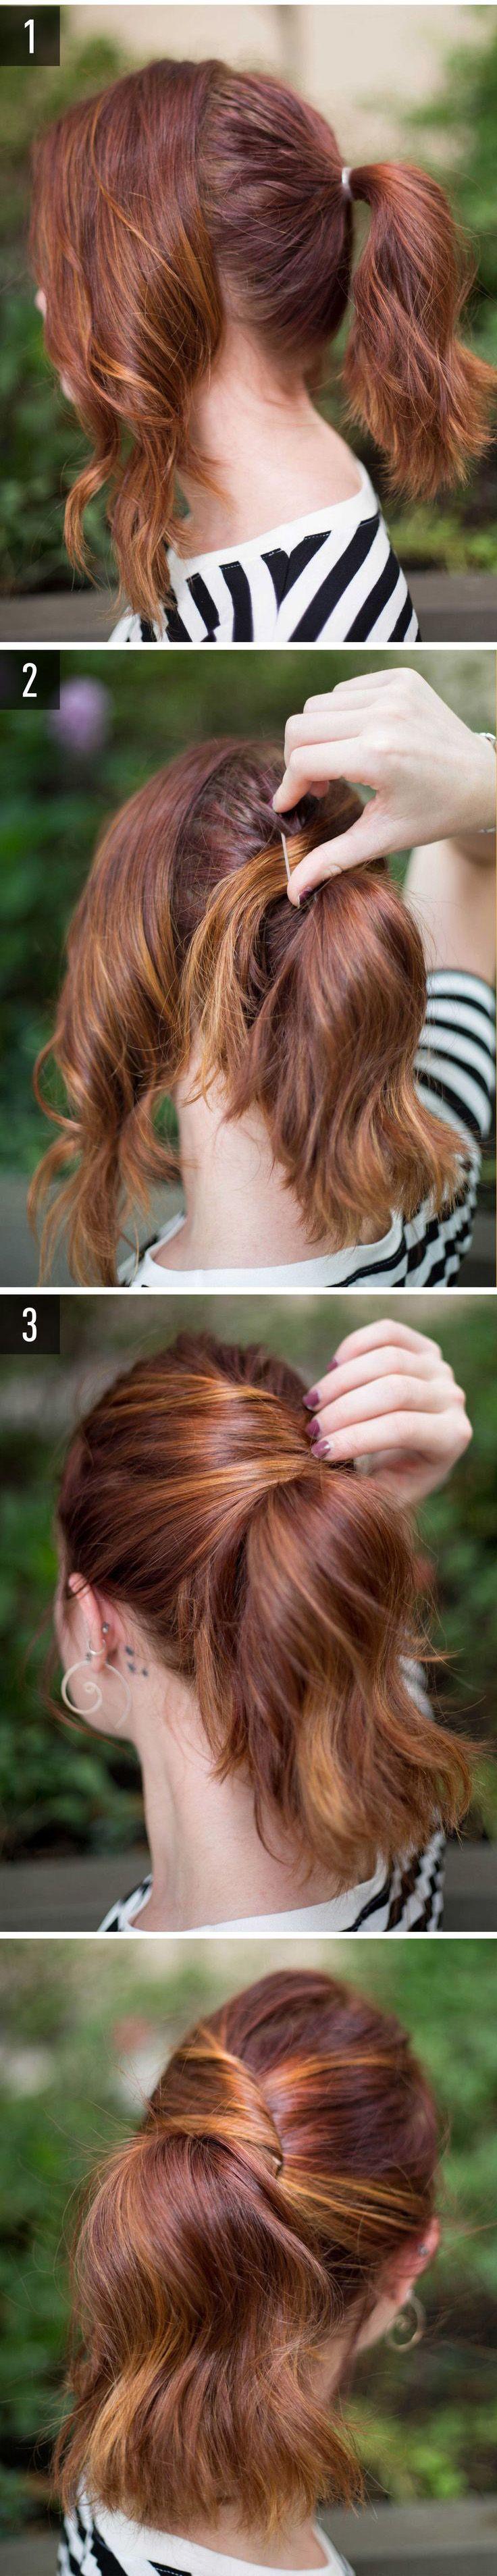 elegant pony hairstyle